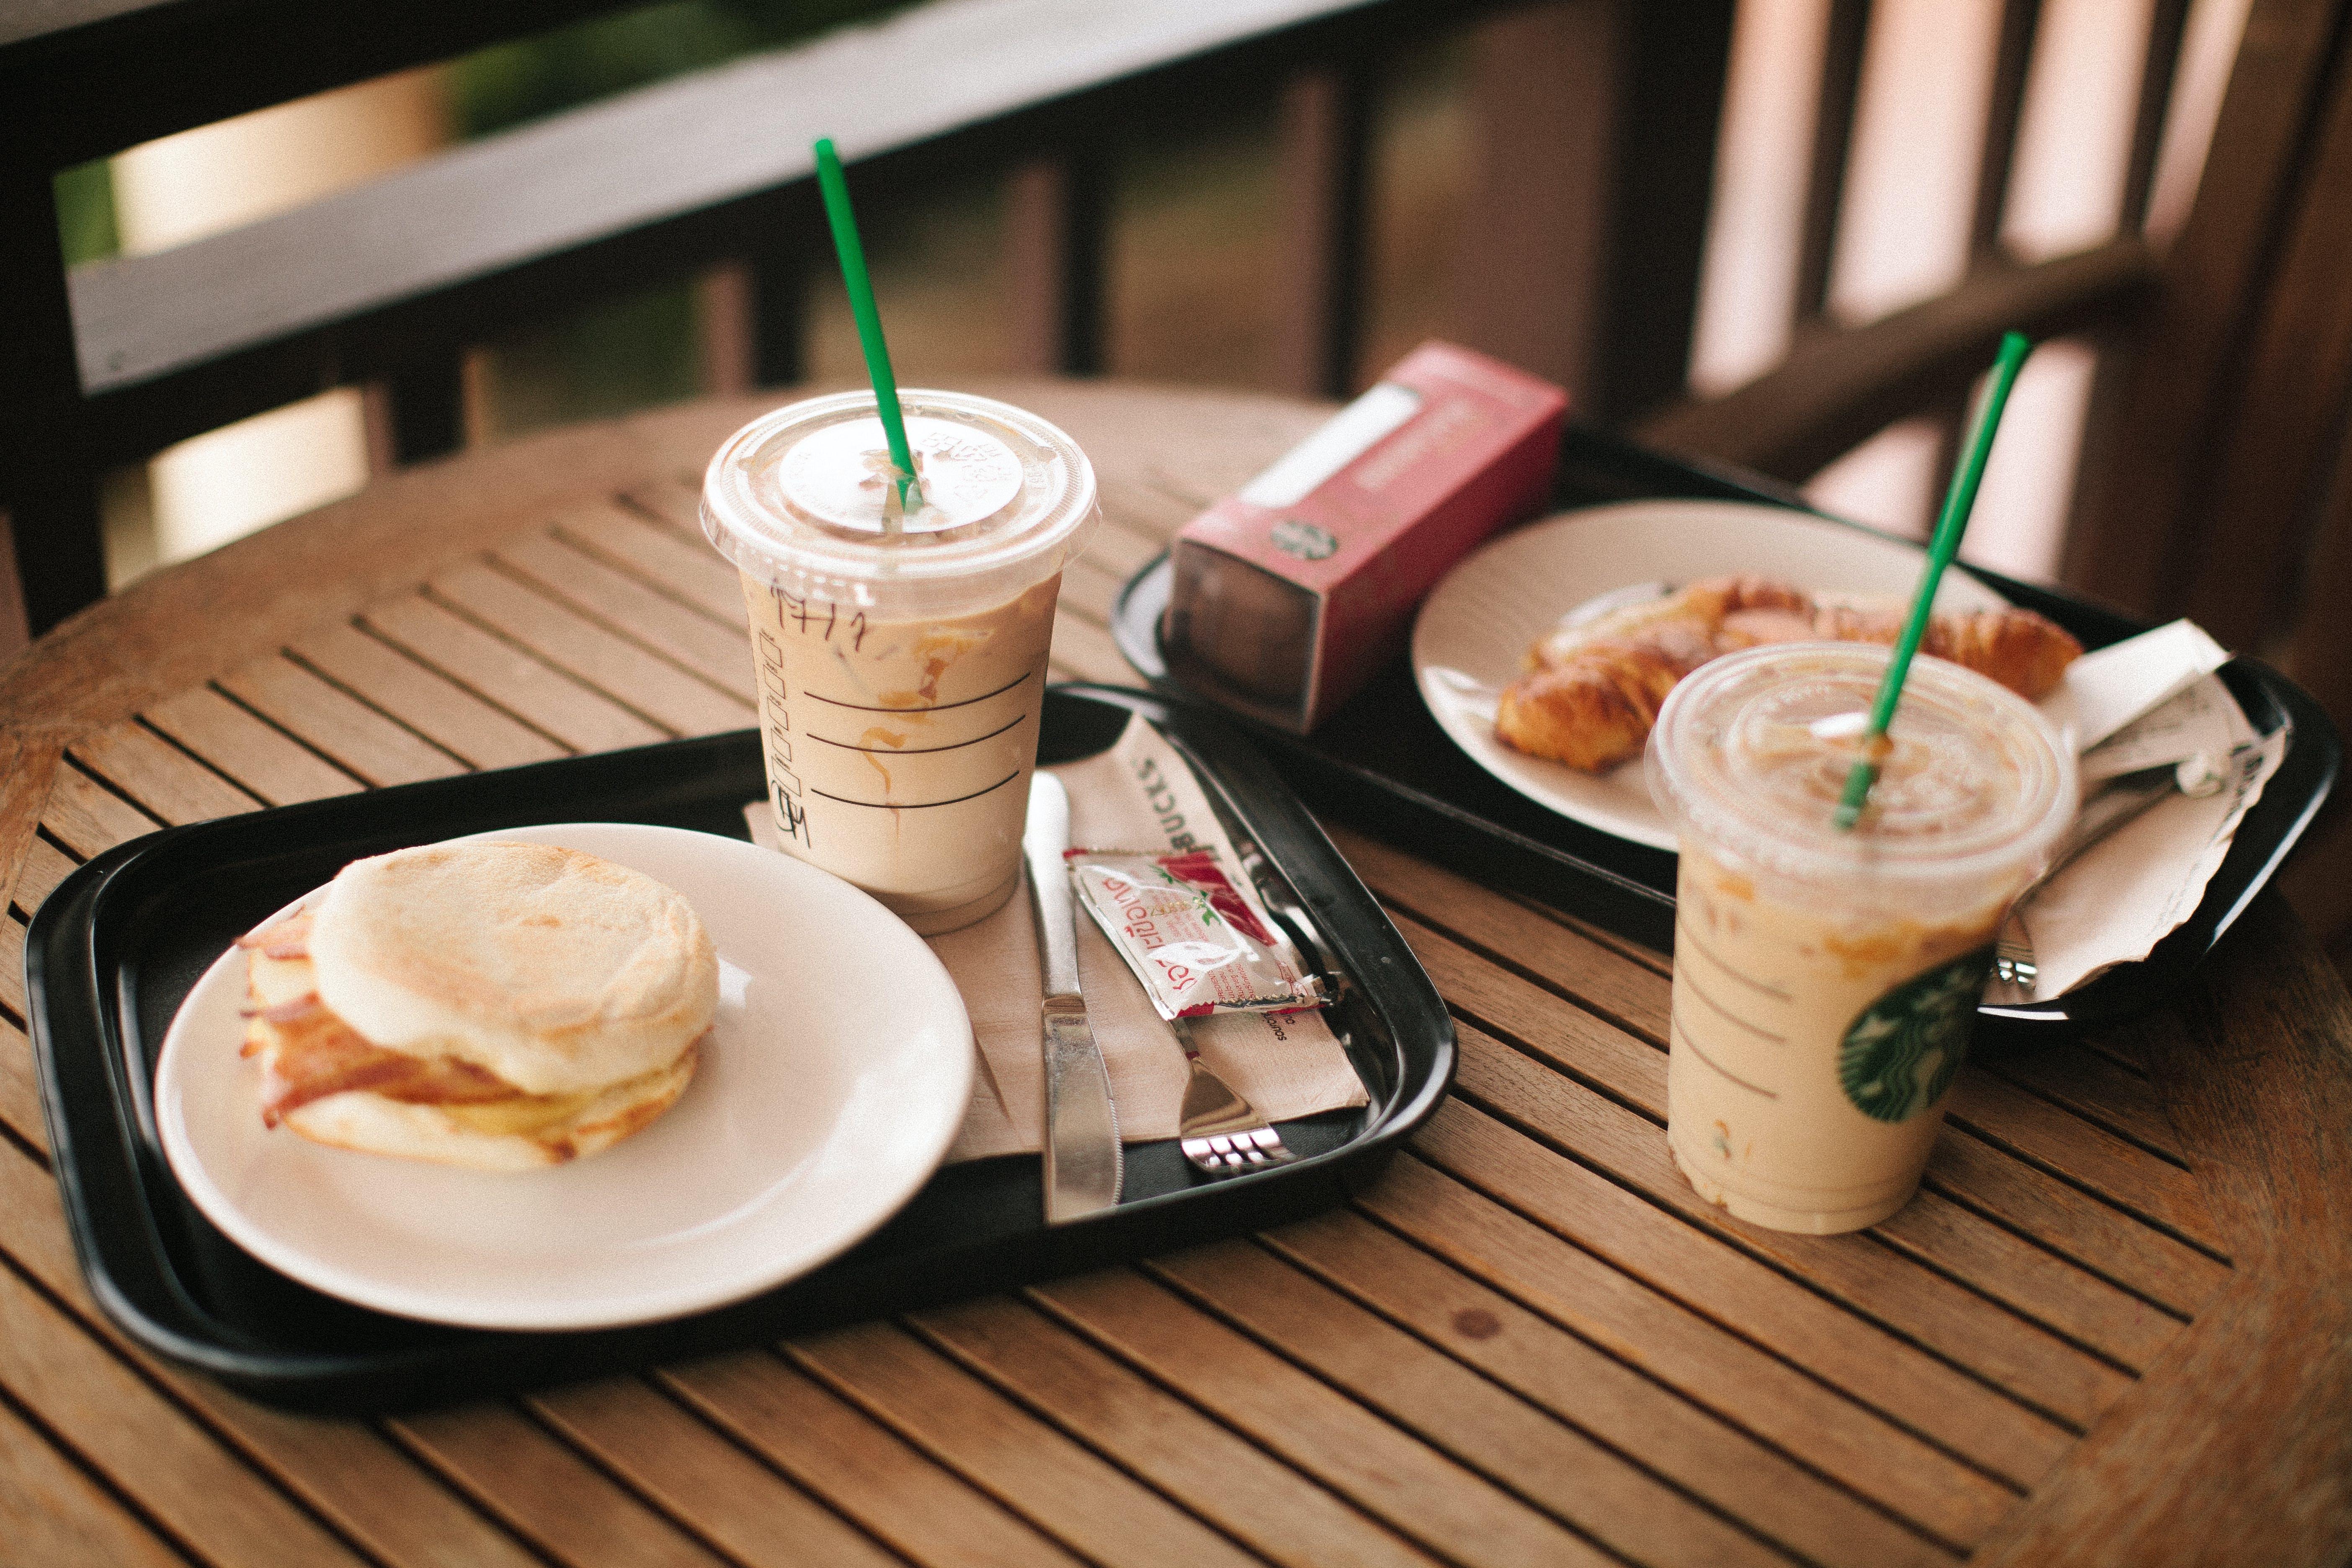 Starbucks Cup On Black Tray